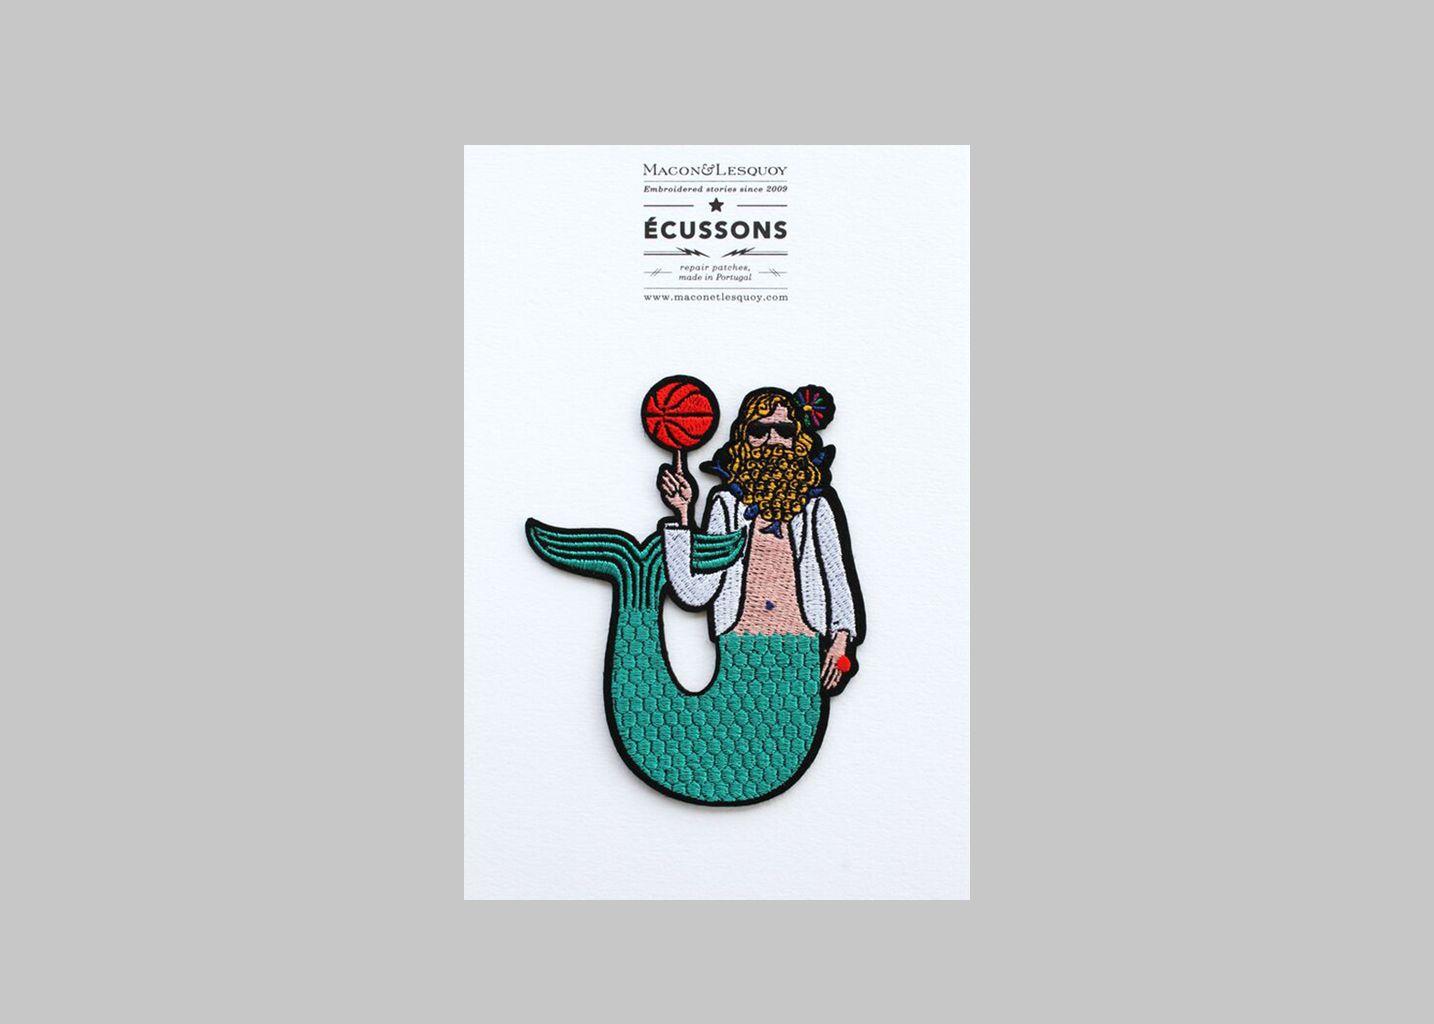 Ecusson Homme Sirene - Macon & Lesquoy